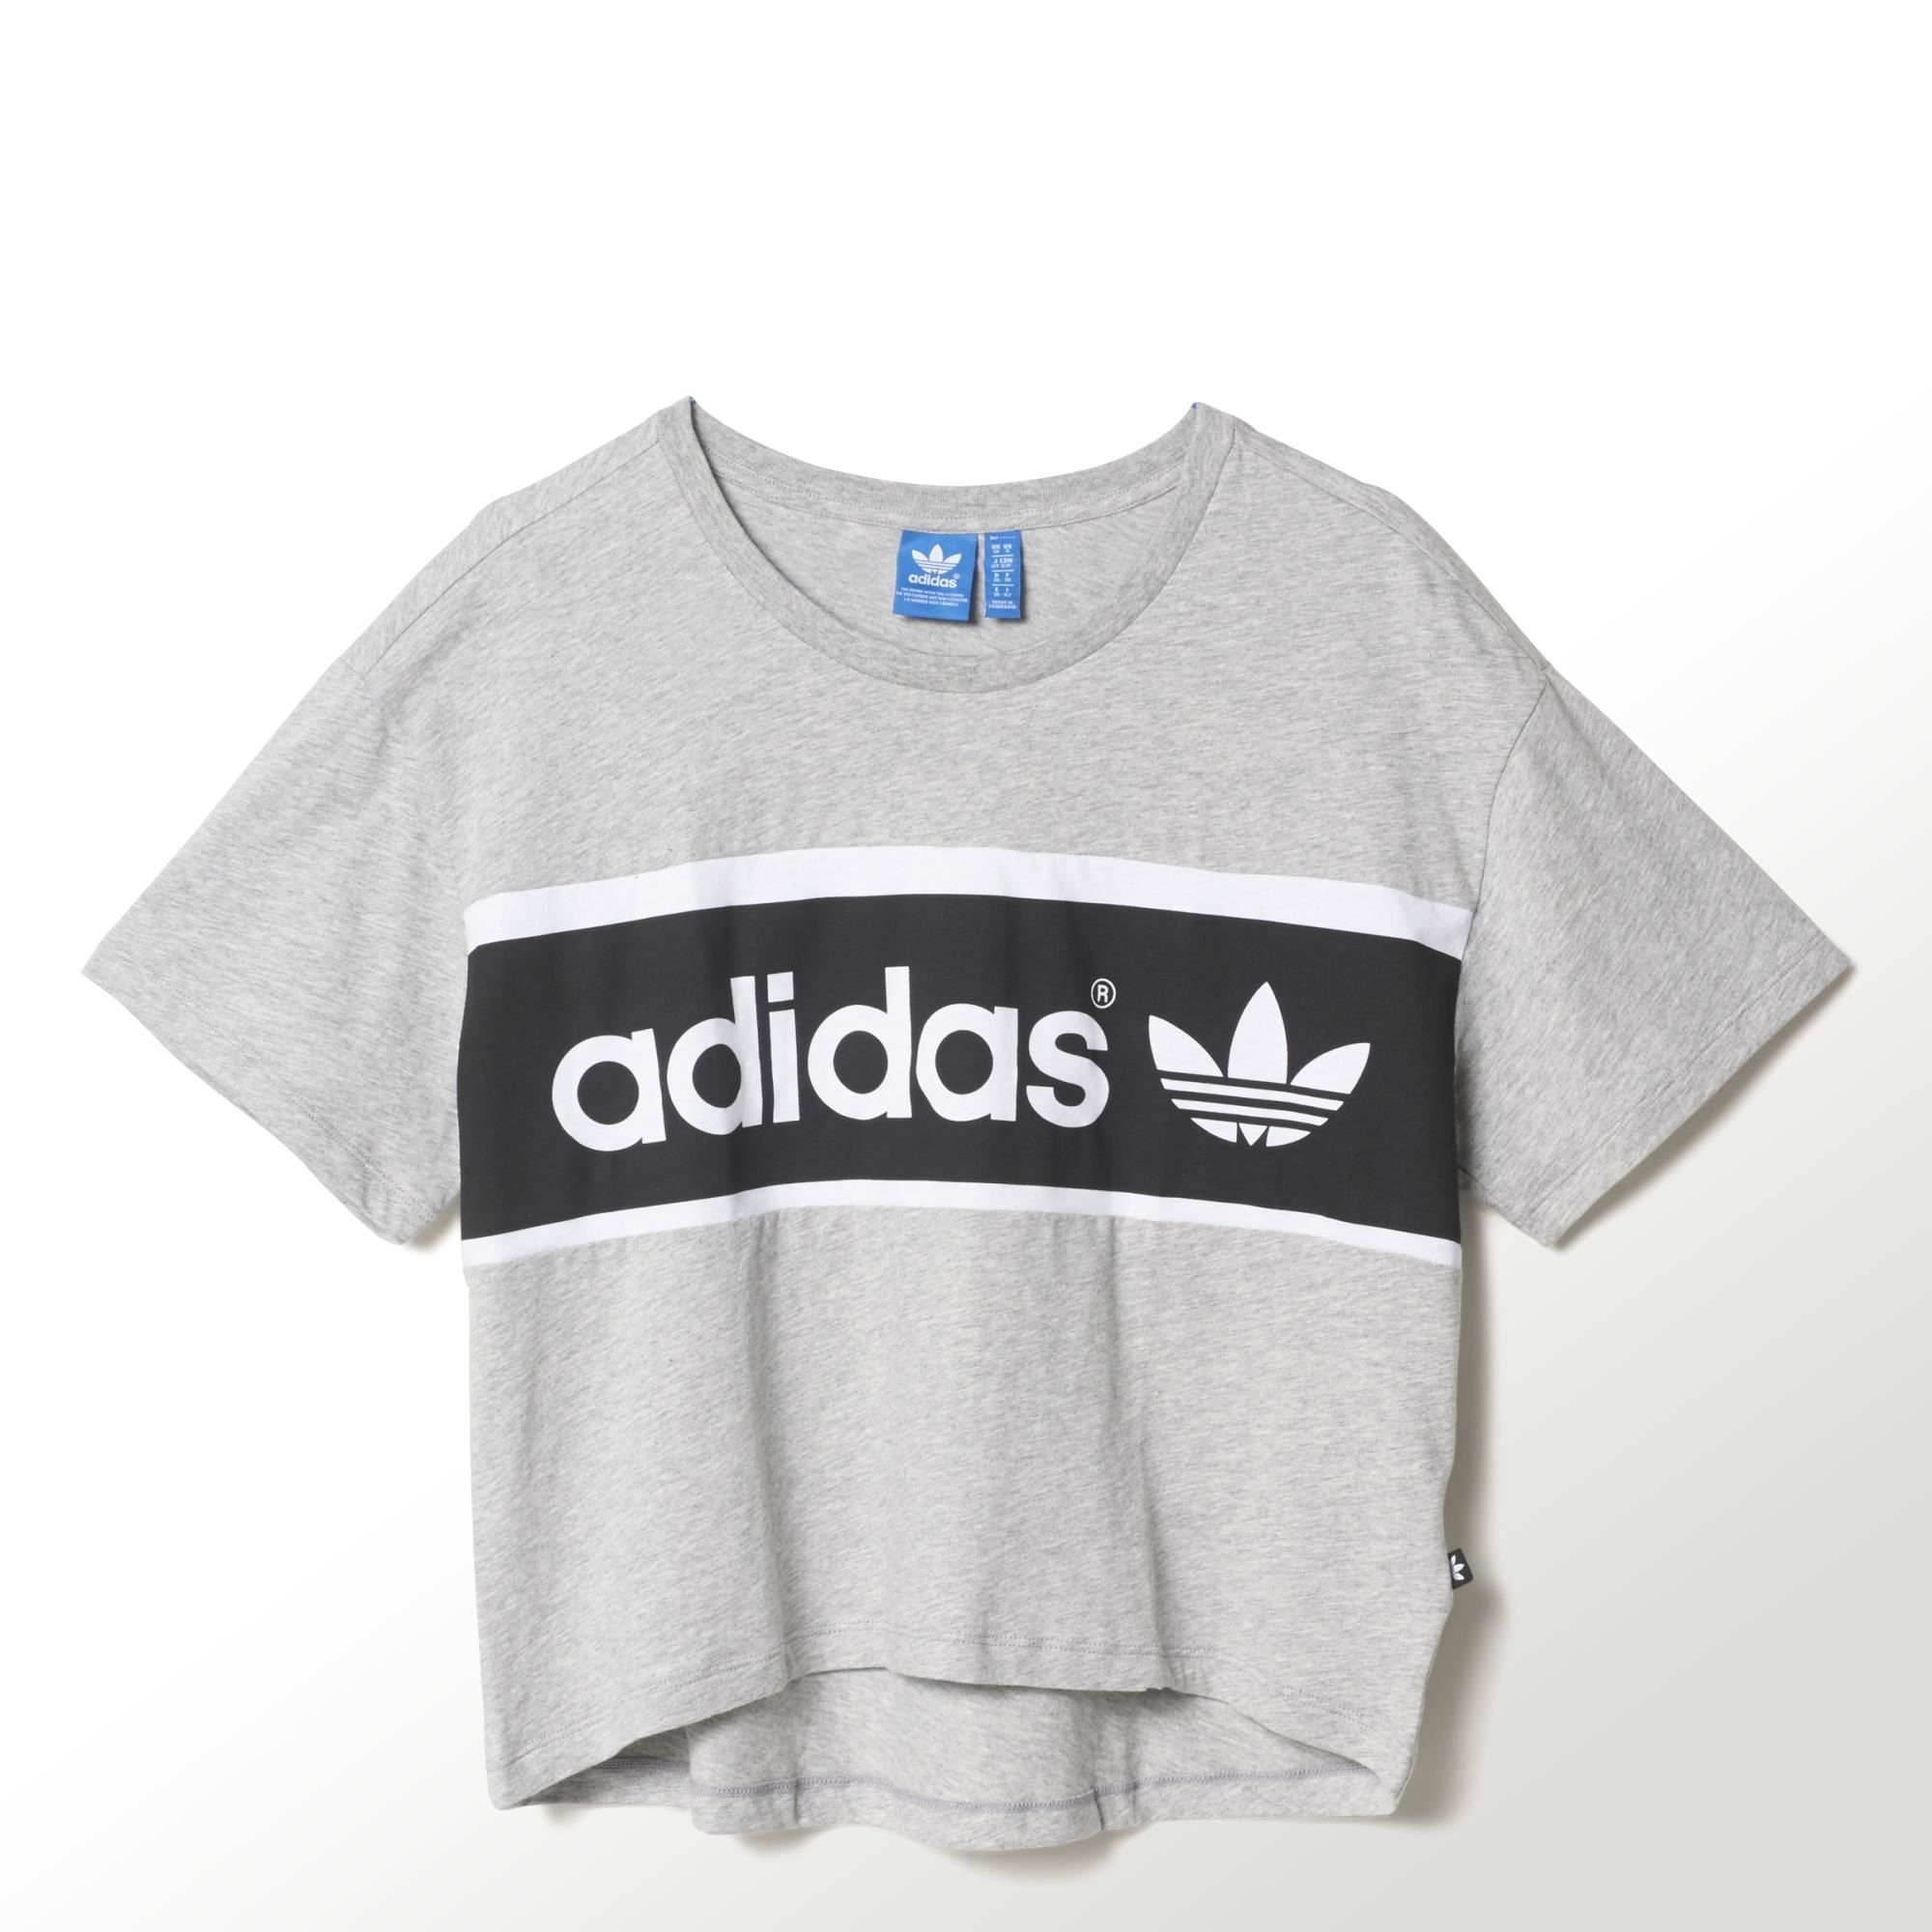 camisetas adidas mujer rebajas